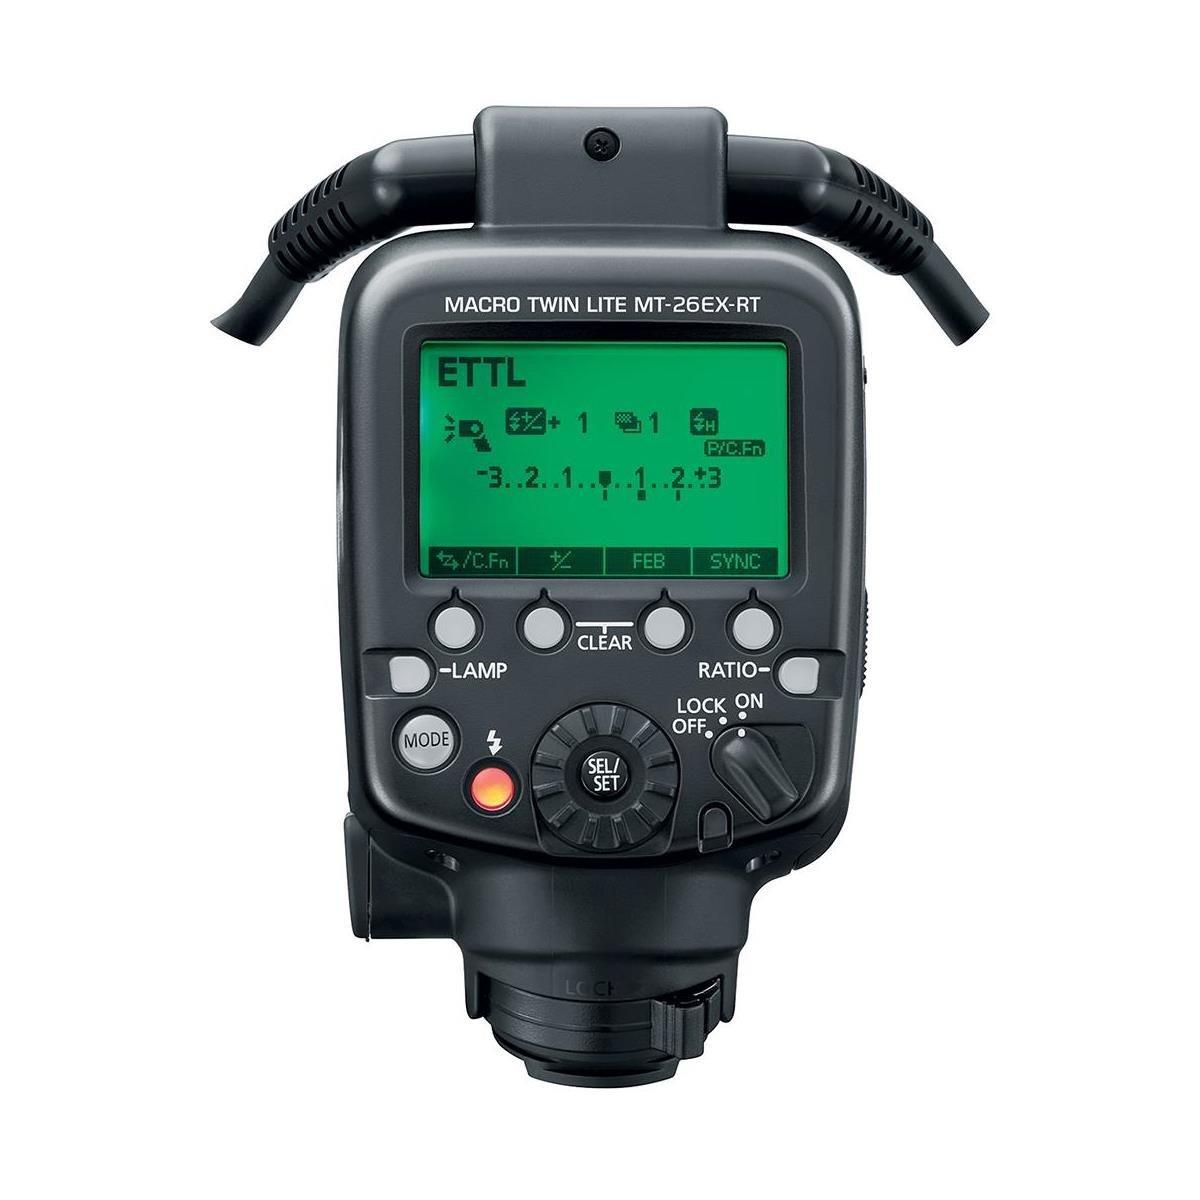 Canon MT-26EX-RT Macro Twin Lite Flash Unit USA Warranty With Accessory Bundle. by Canon (Image #3)